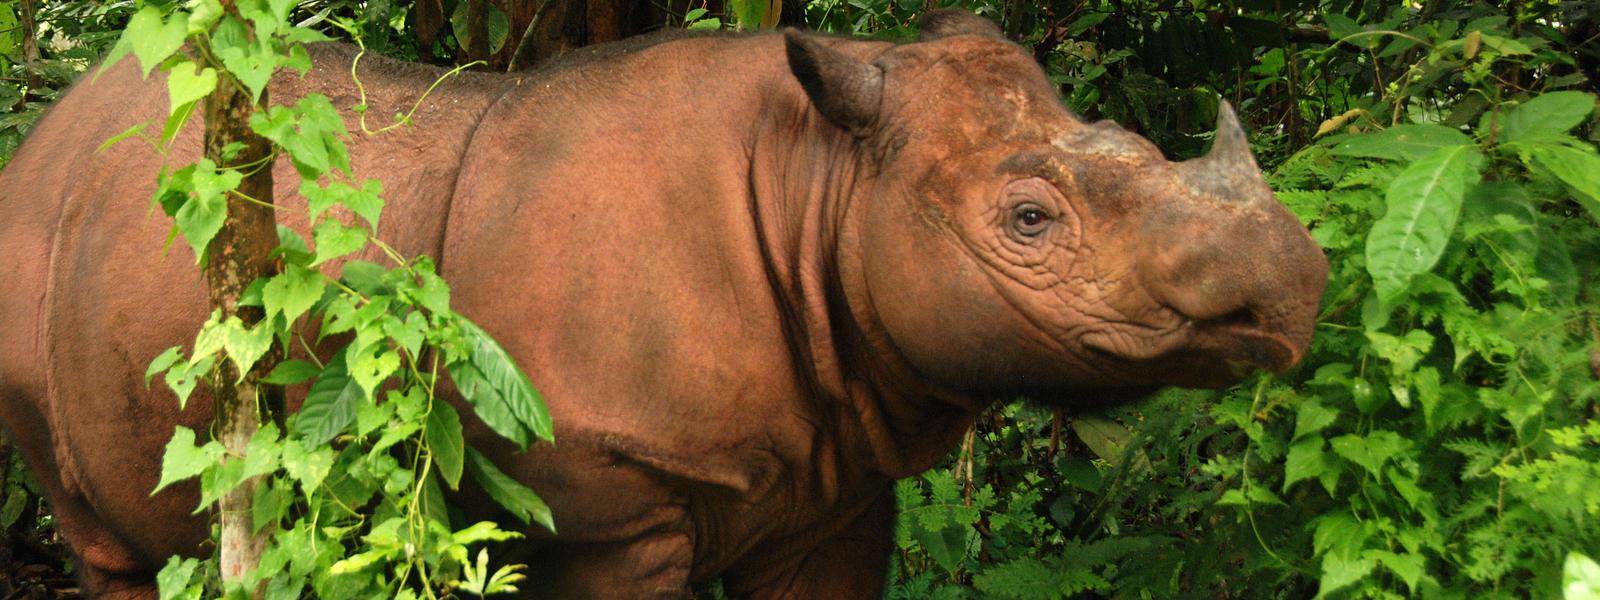 Struggling to hang on... (photo by Bill Konstant, International Rhino Foundation)